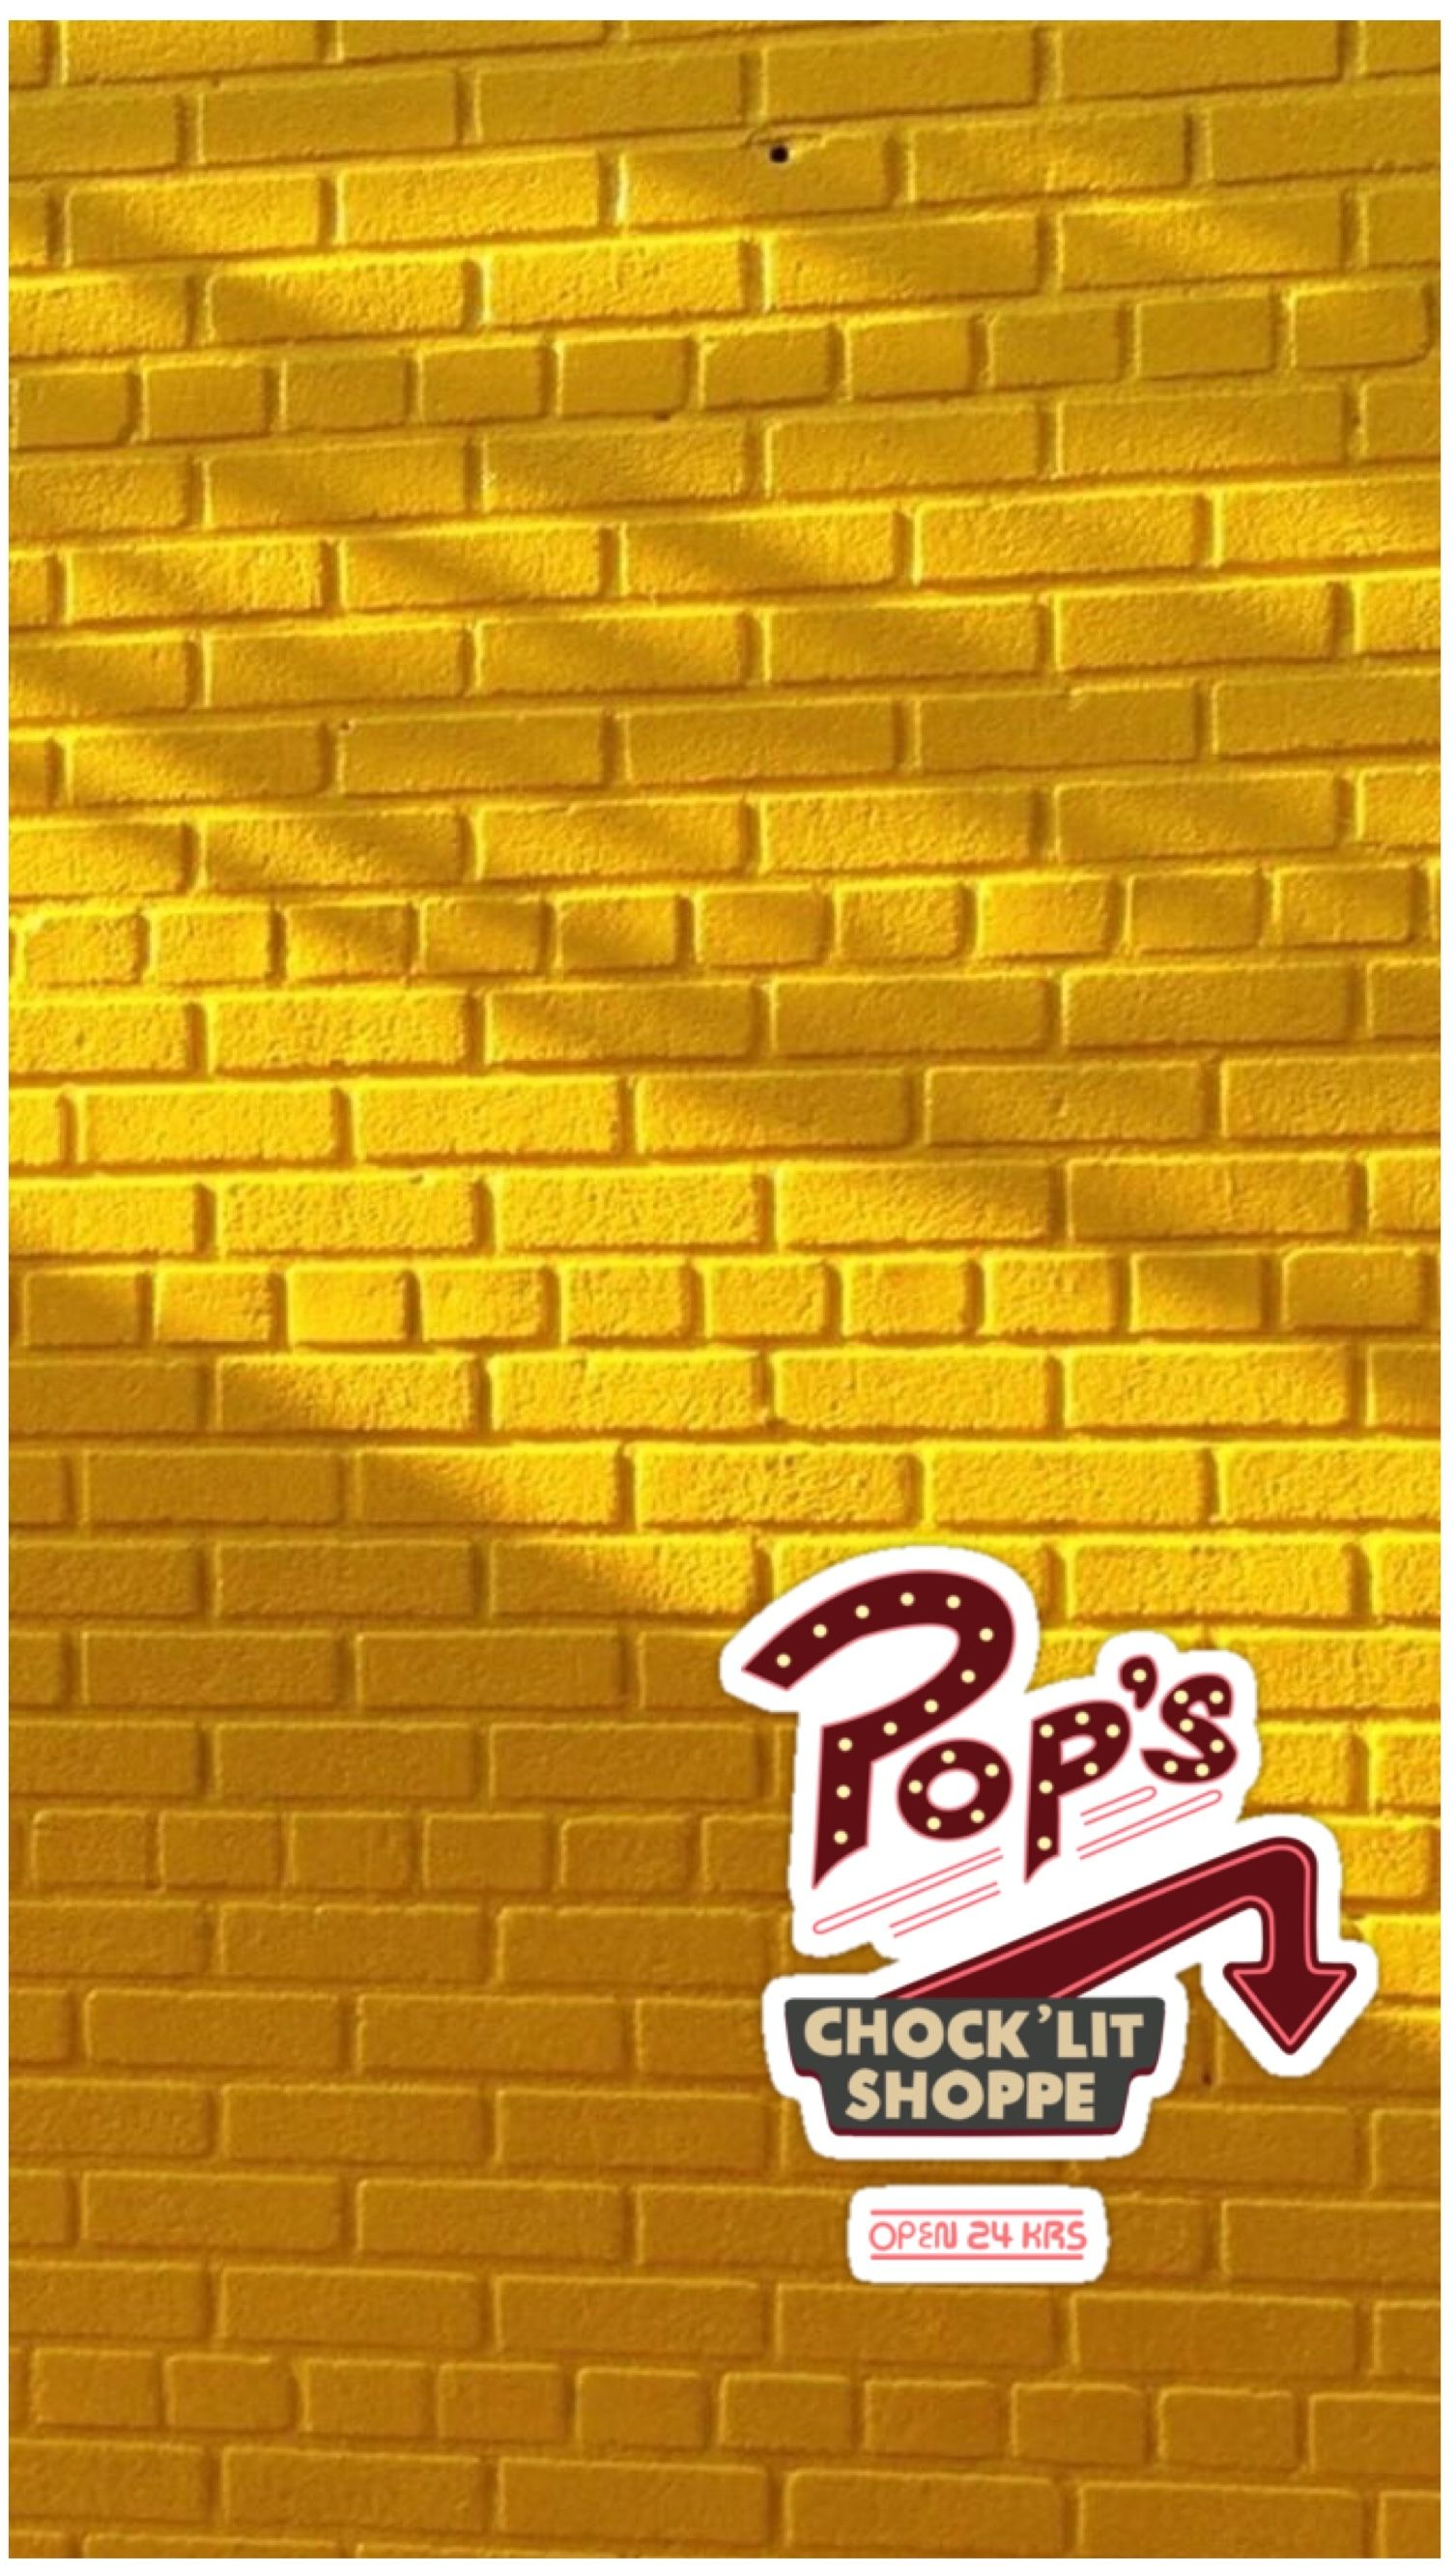 Riverdale Pop's Phone wallpaper Iphone Fond écran